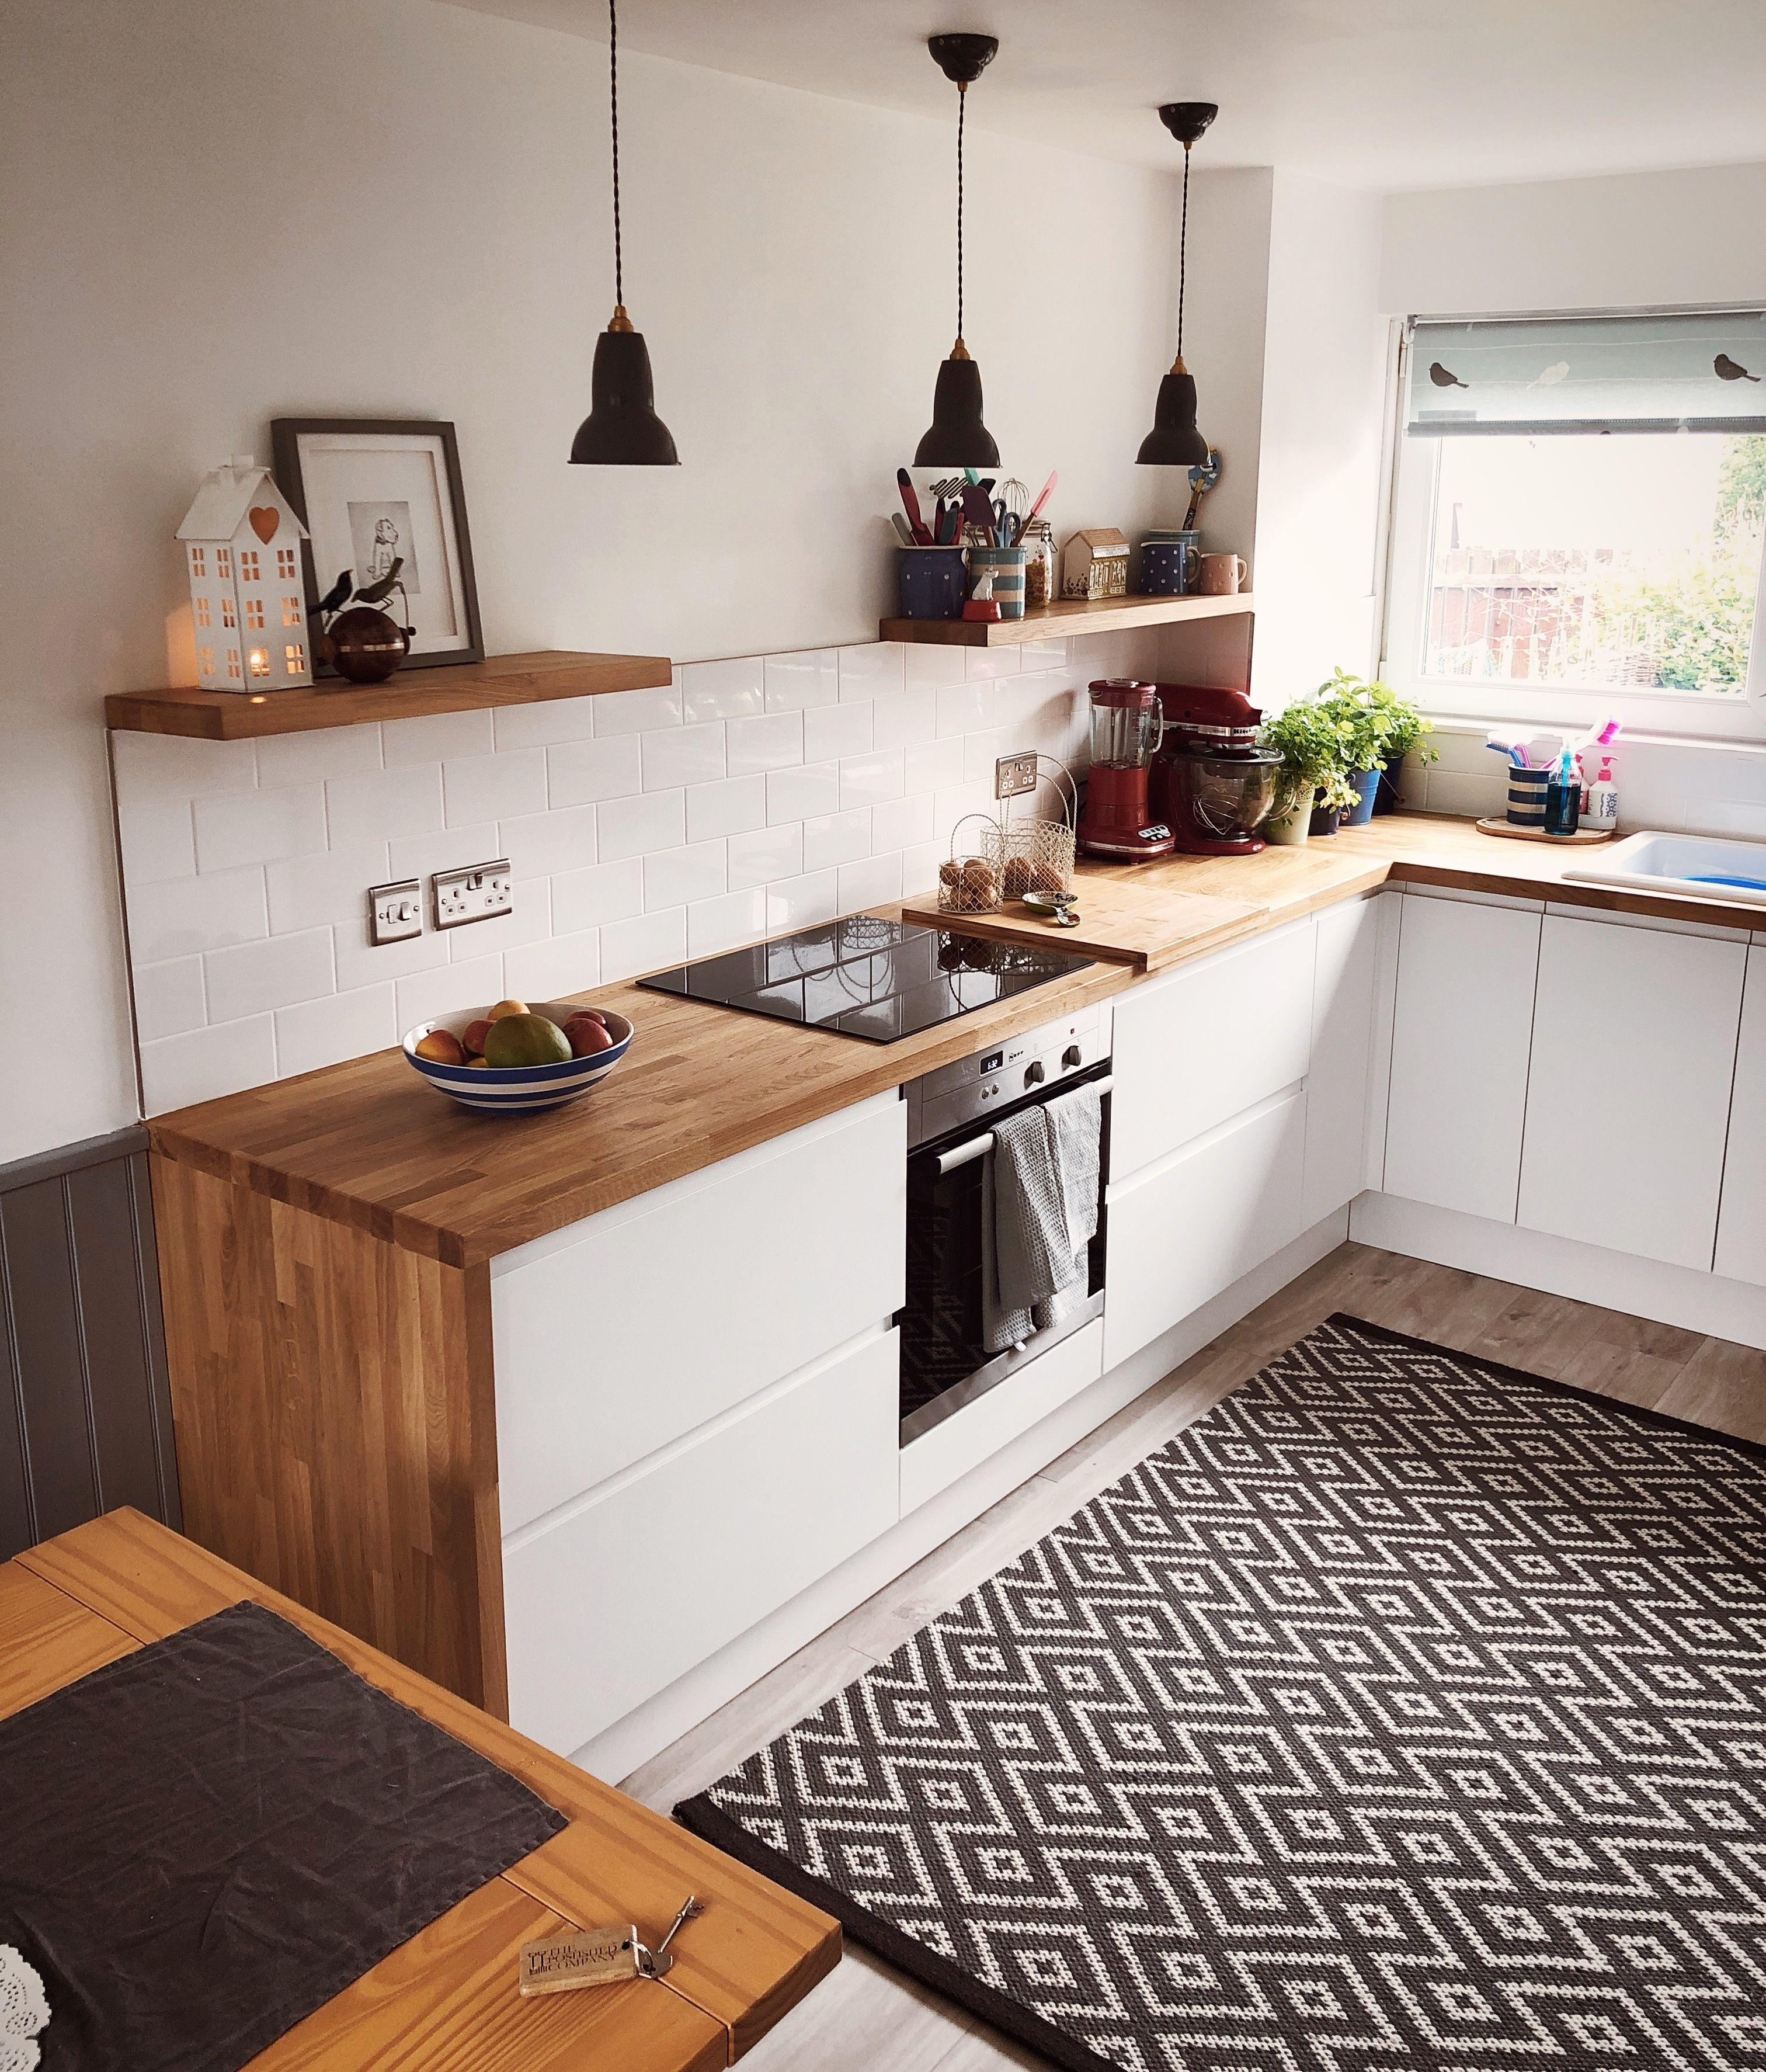 Minimalist Kitchen Decor: 10 Elegant Minimalist Kitchen Ideas, Best For Simple